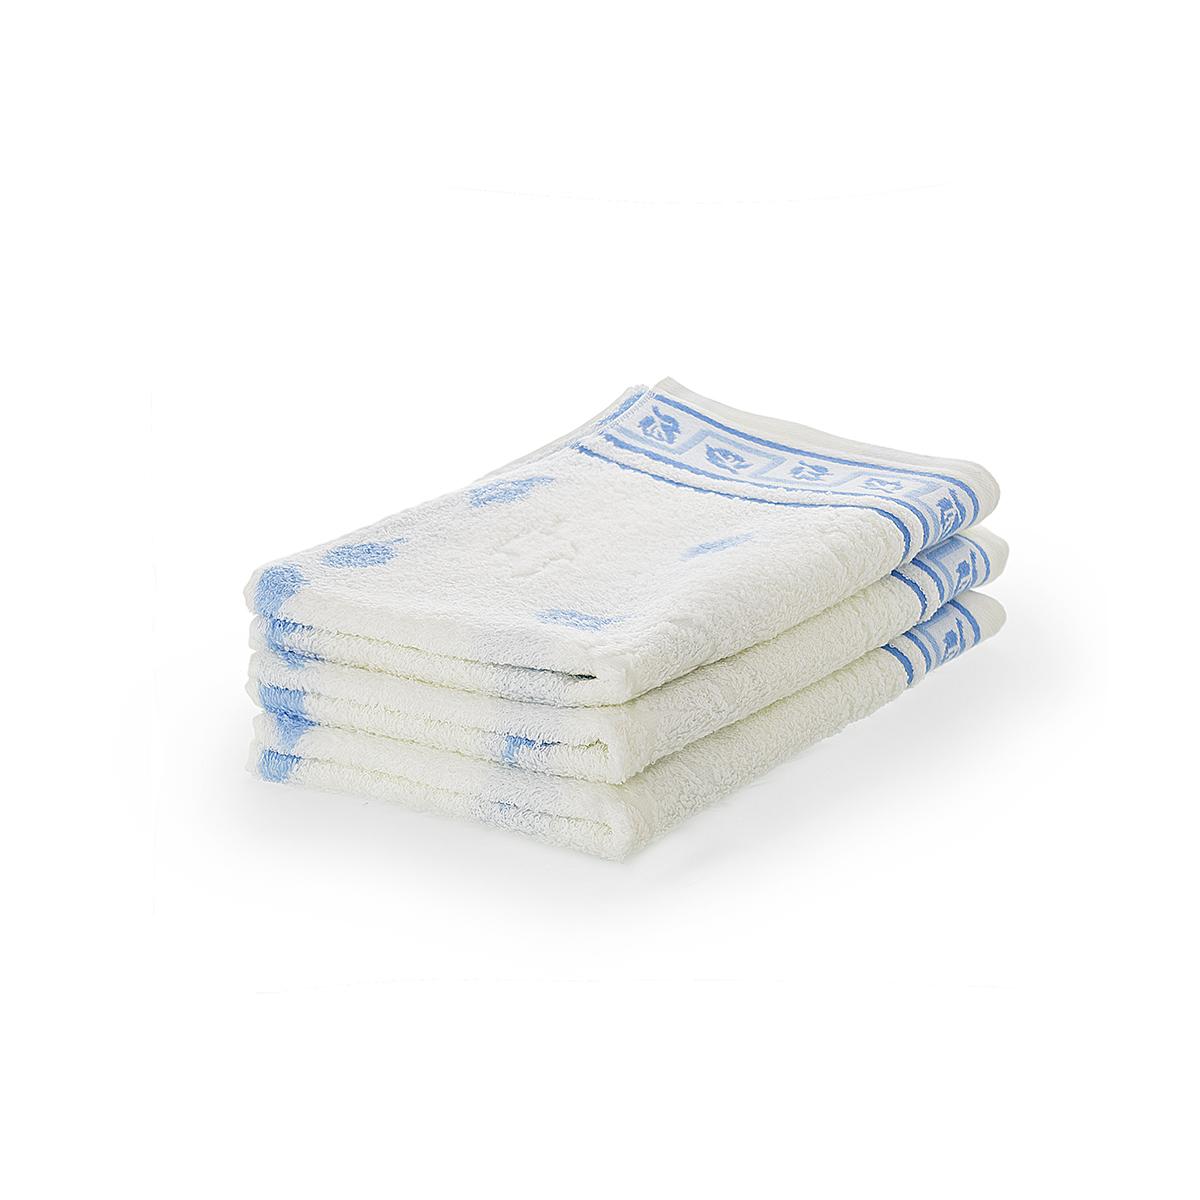 Полотенце Листопад Голубой, размер 65х135 смМахровые полотенца<br>Плотность ткани: 480 г/кв. м.<br><br>Тип: Полотенце<br>Размер: 65х135<br>Материал: Махра